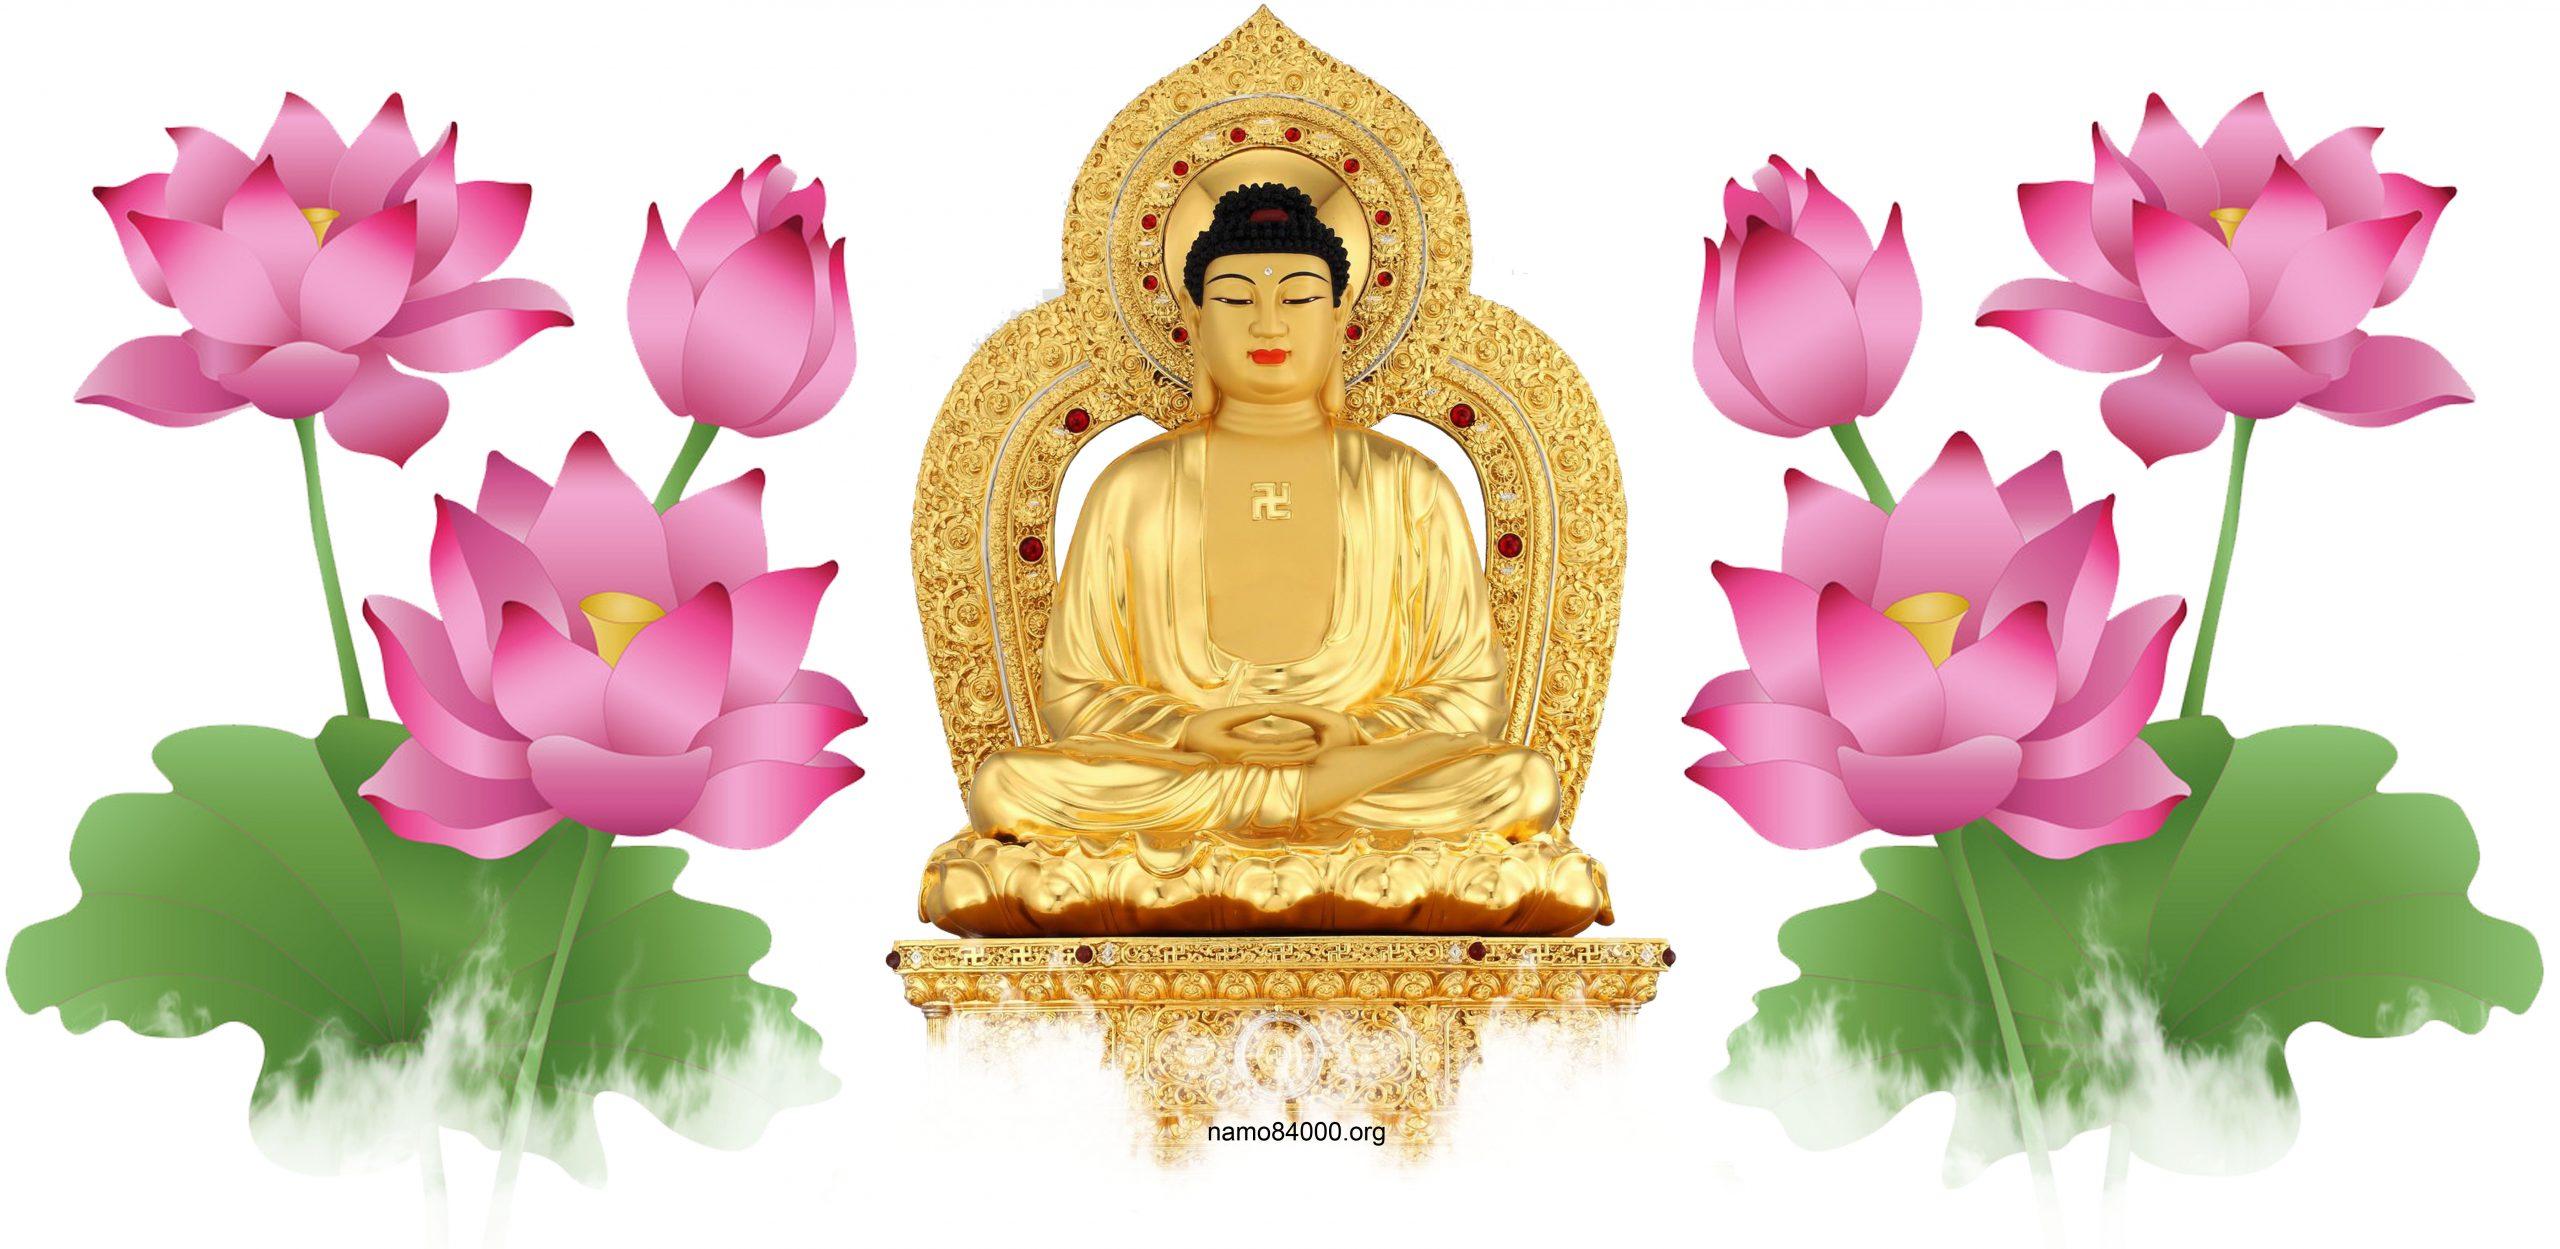 Phật Tương Lai